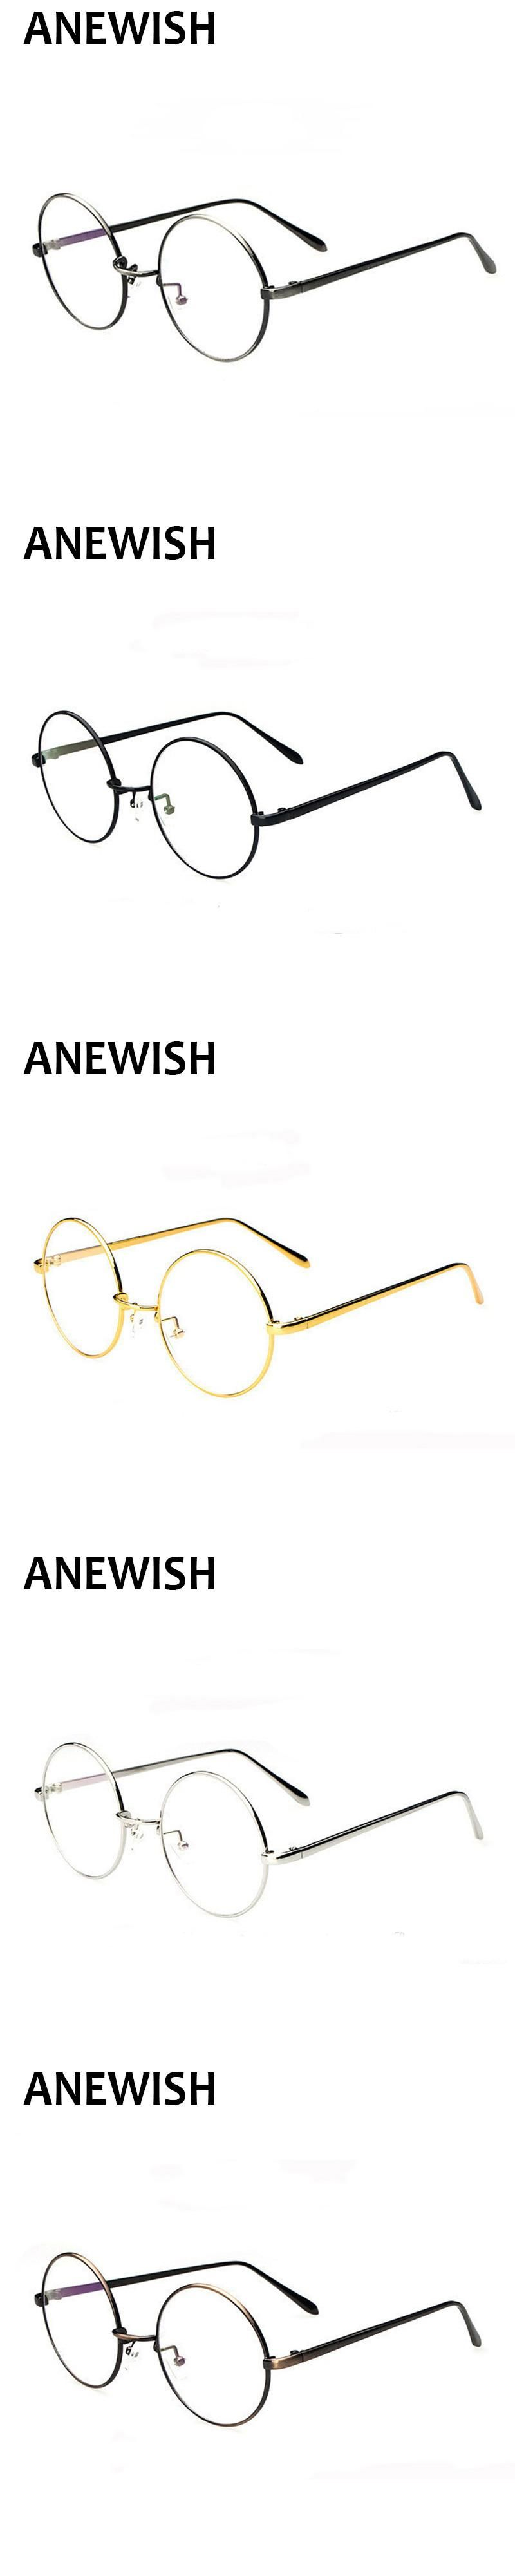 72aca140947 Eyewear Women Men Fashion Ultra Light Brand Designer Big Round Metal  Glasses Frame Retro Oculos De